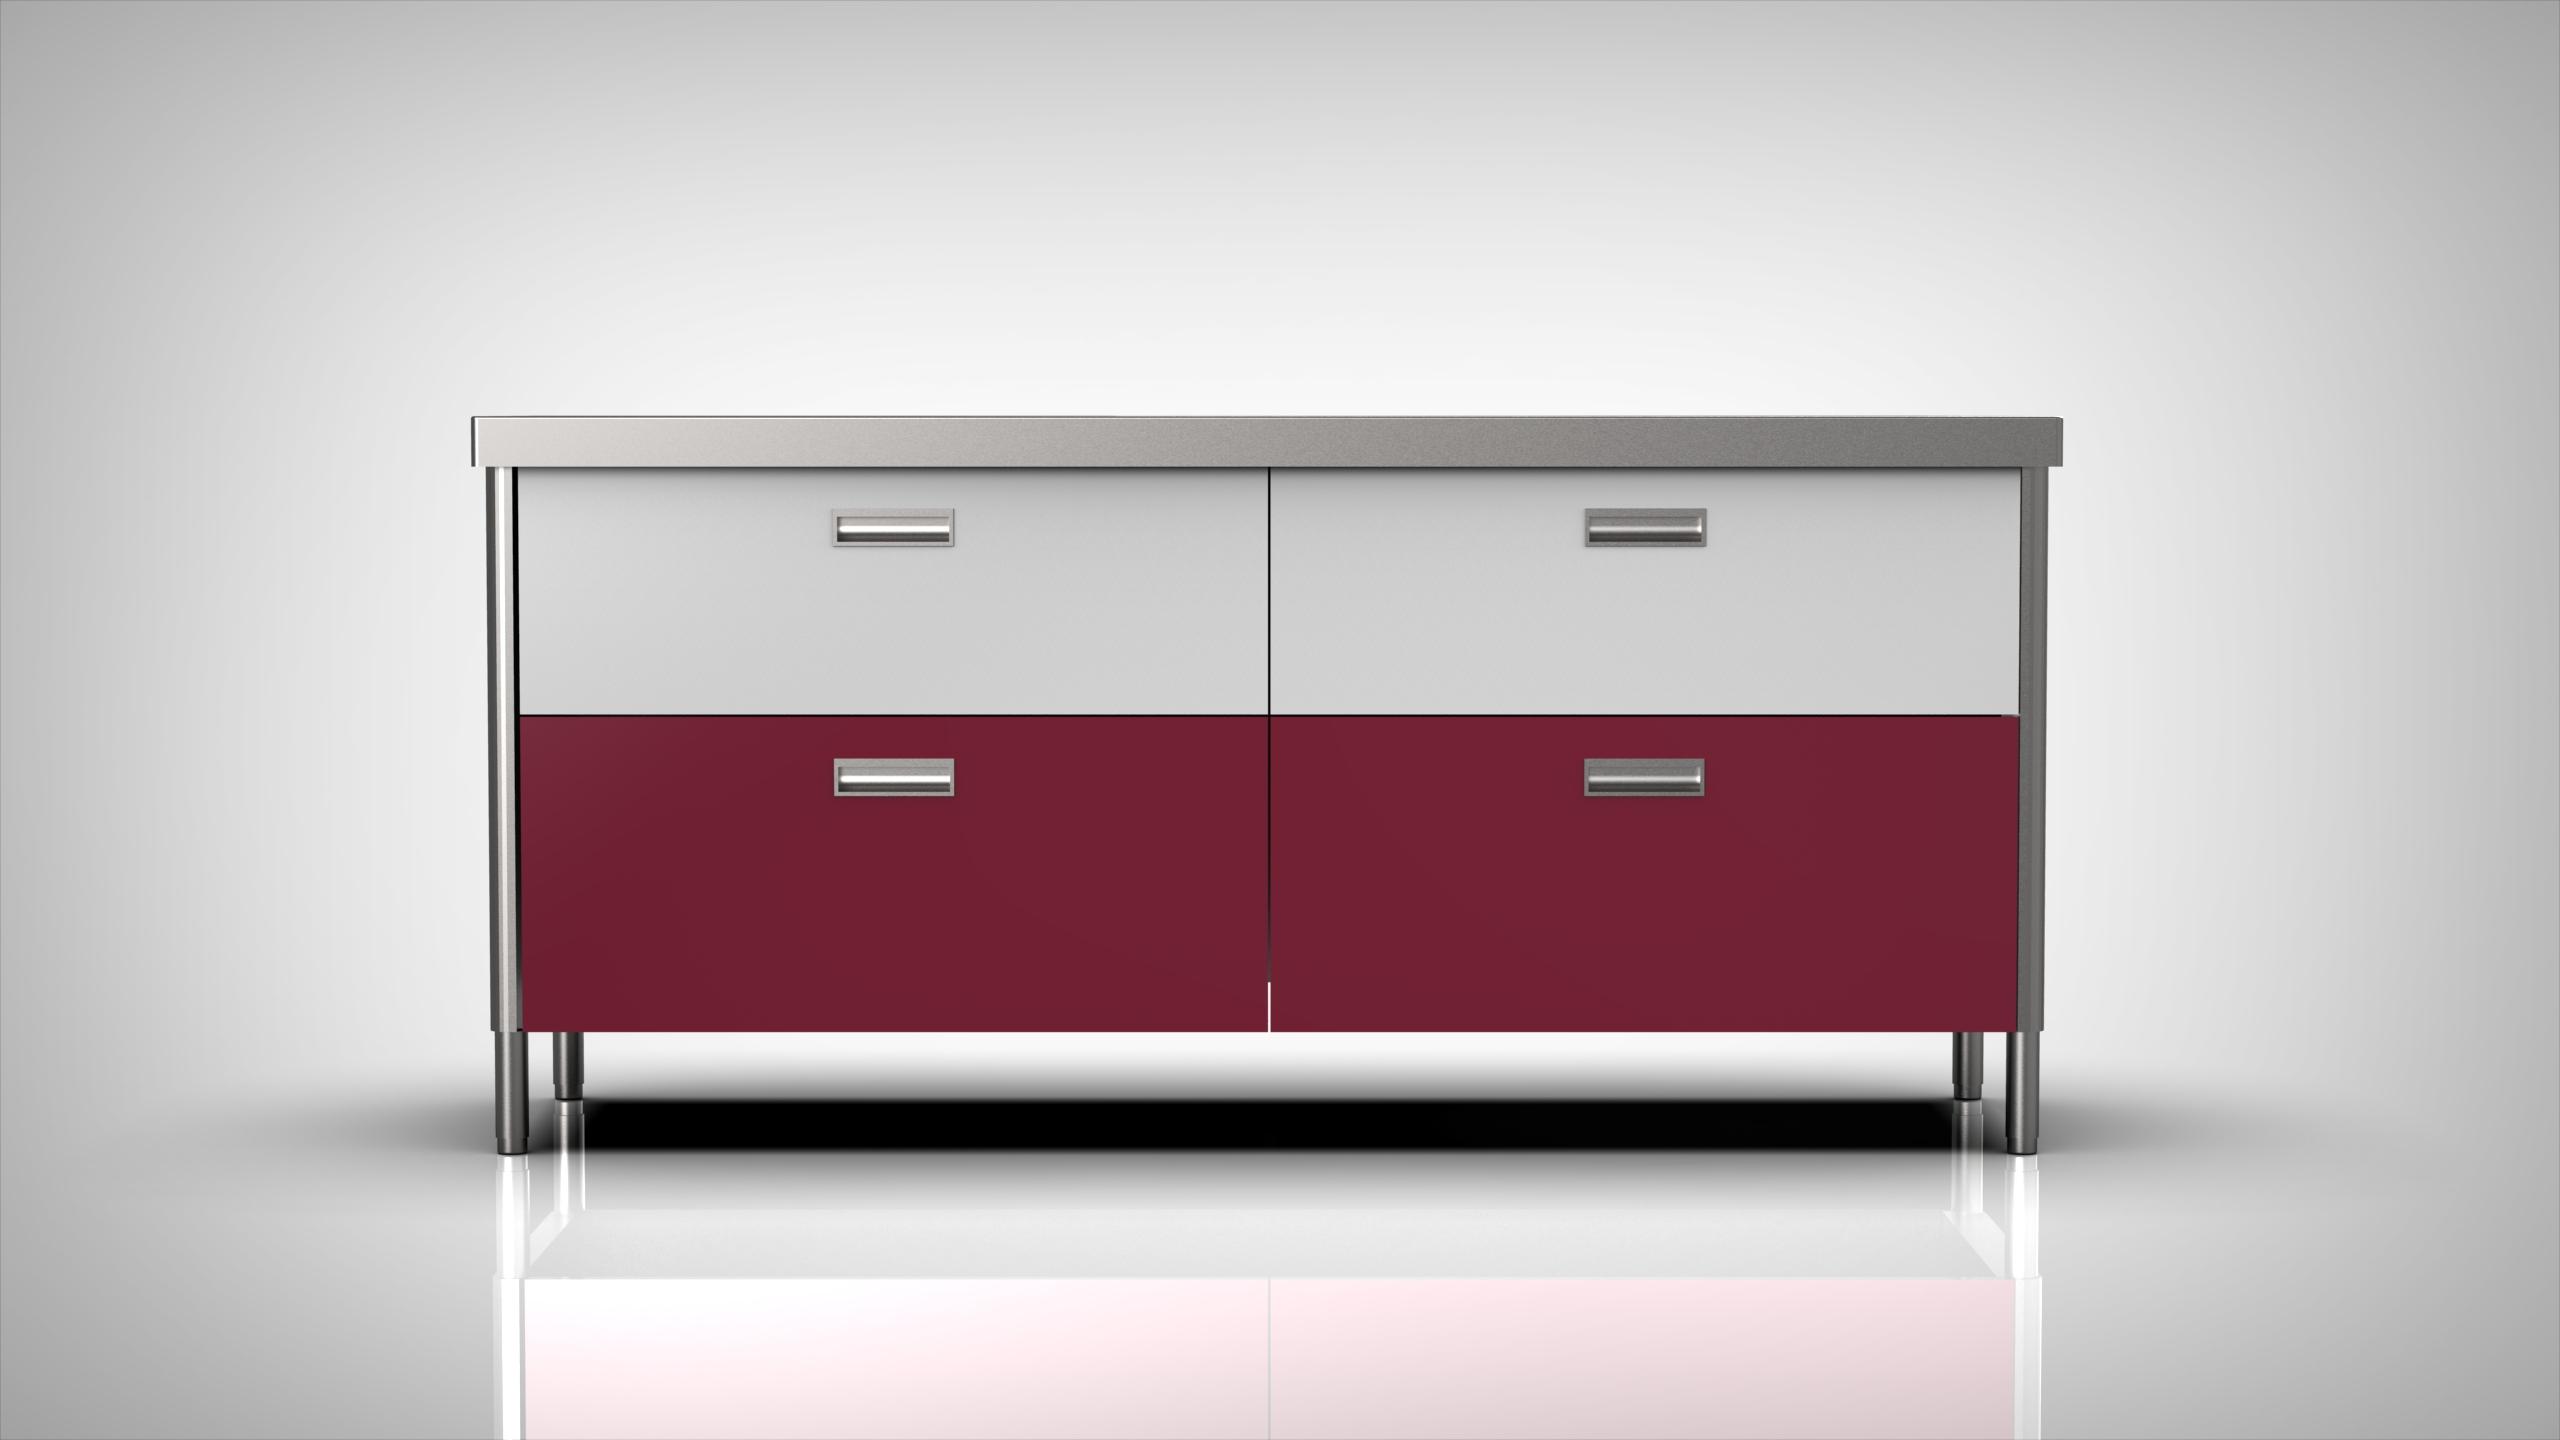 Arca Cucine Italy - Levanto - Modulo 190 - drawers - Sink 190 - Black and Fuchsia